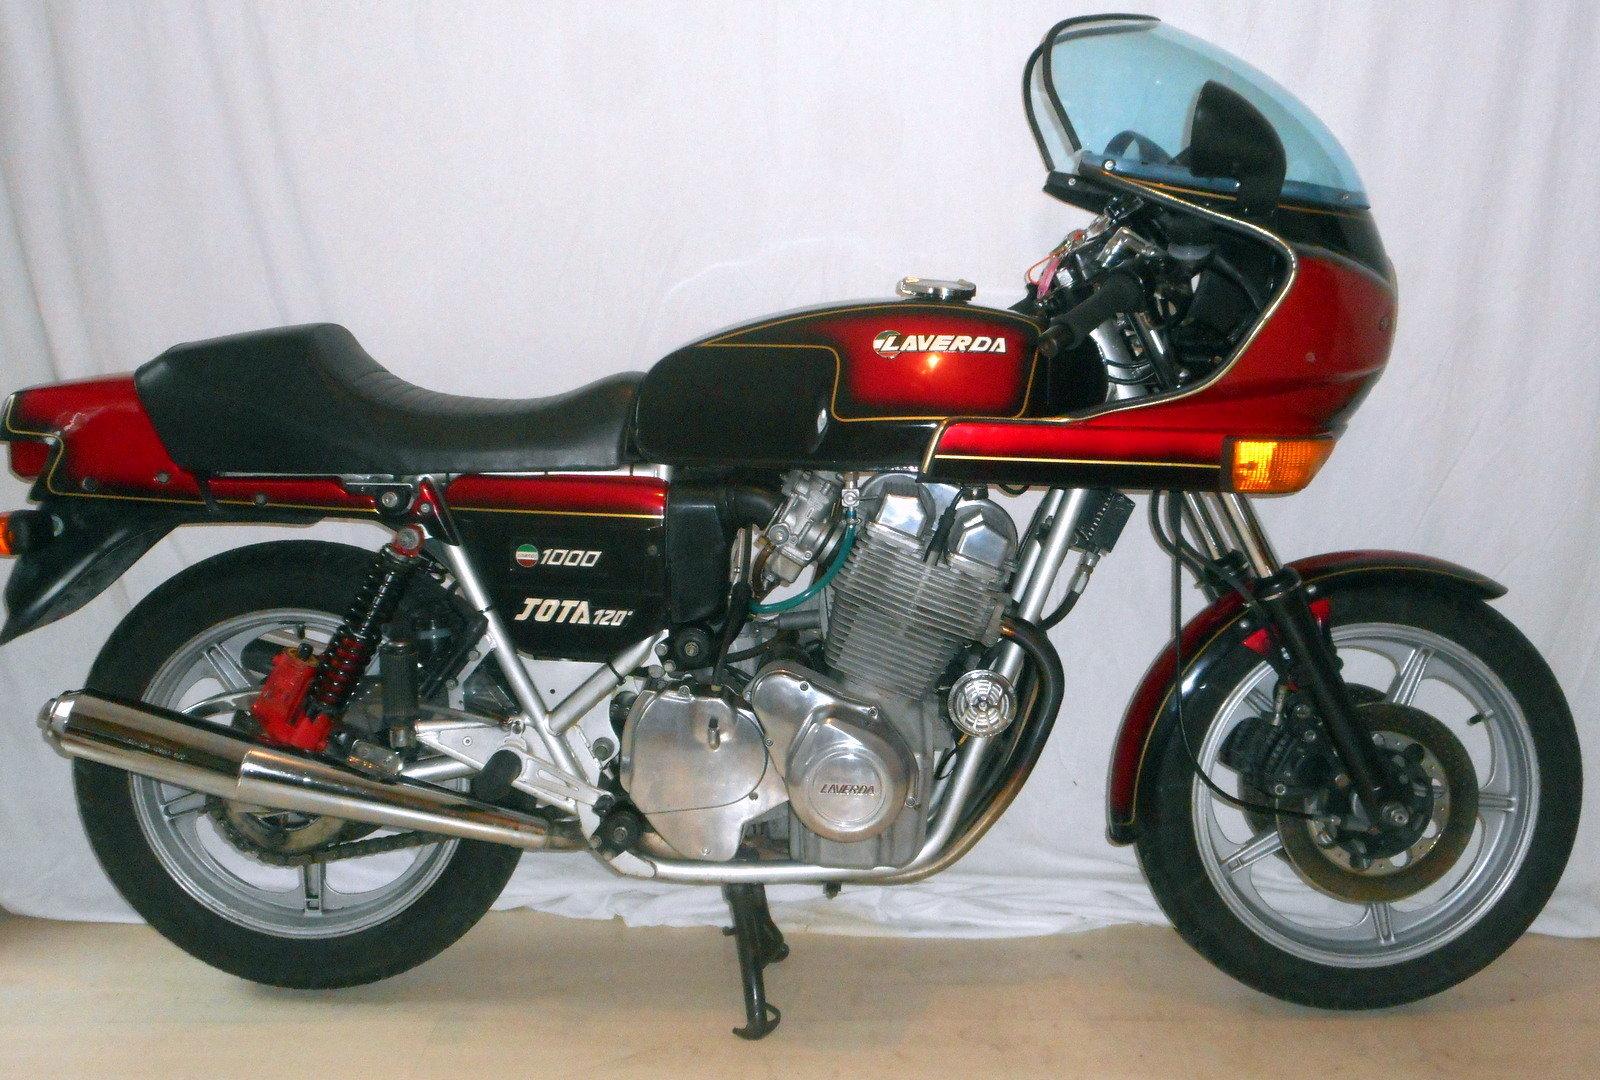 1982 Laverda jota 120 original For Sale (picture 4 of 4)